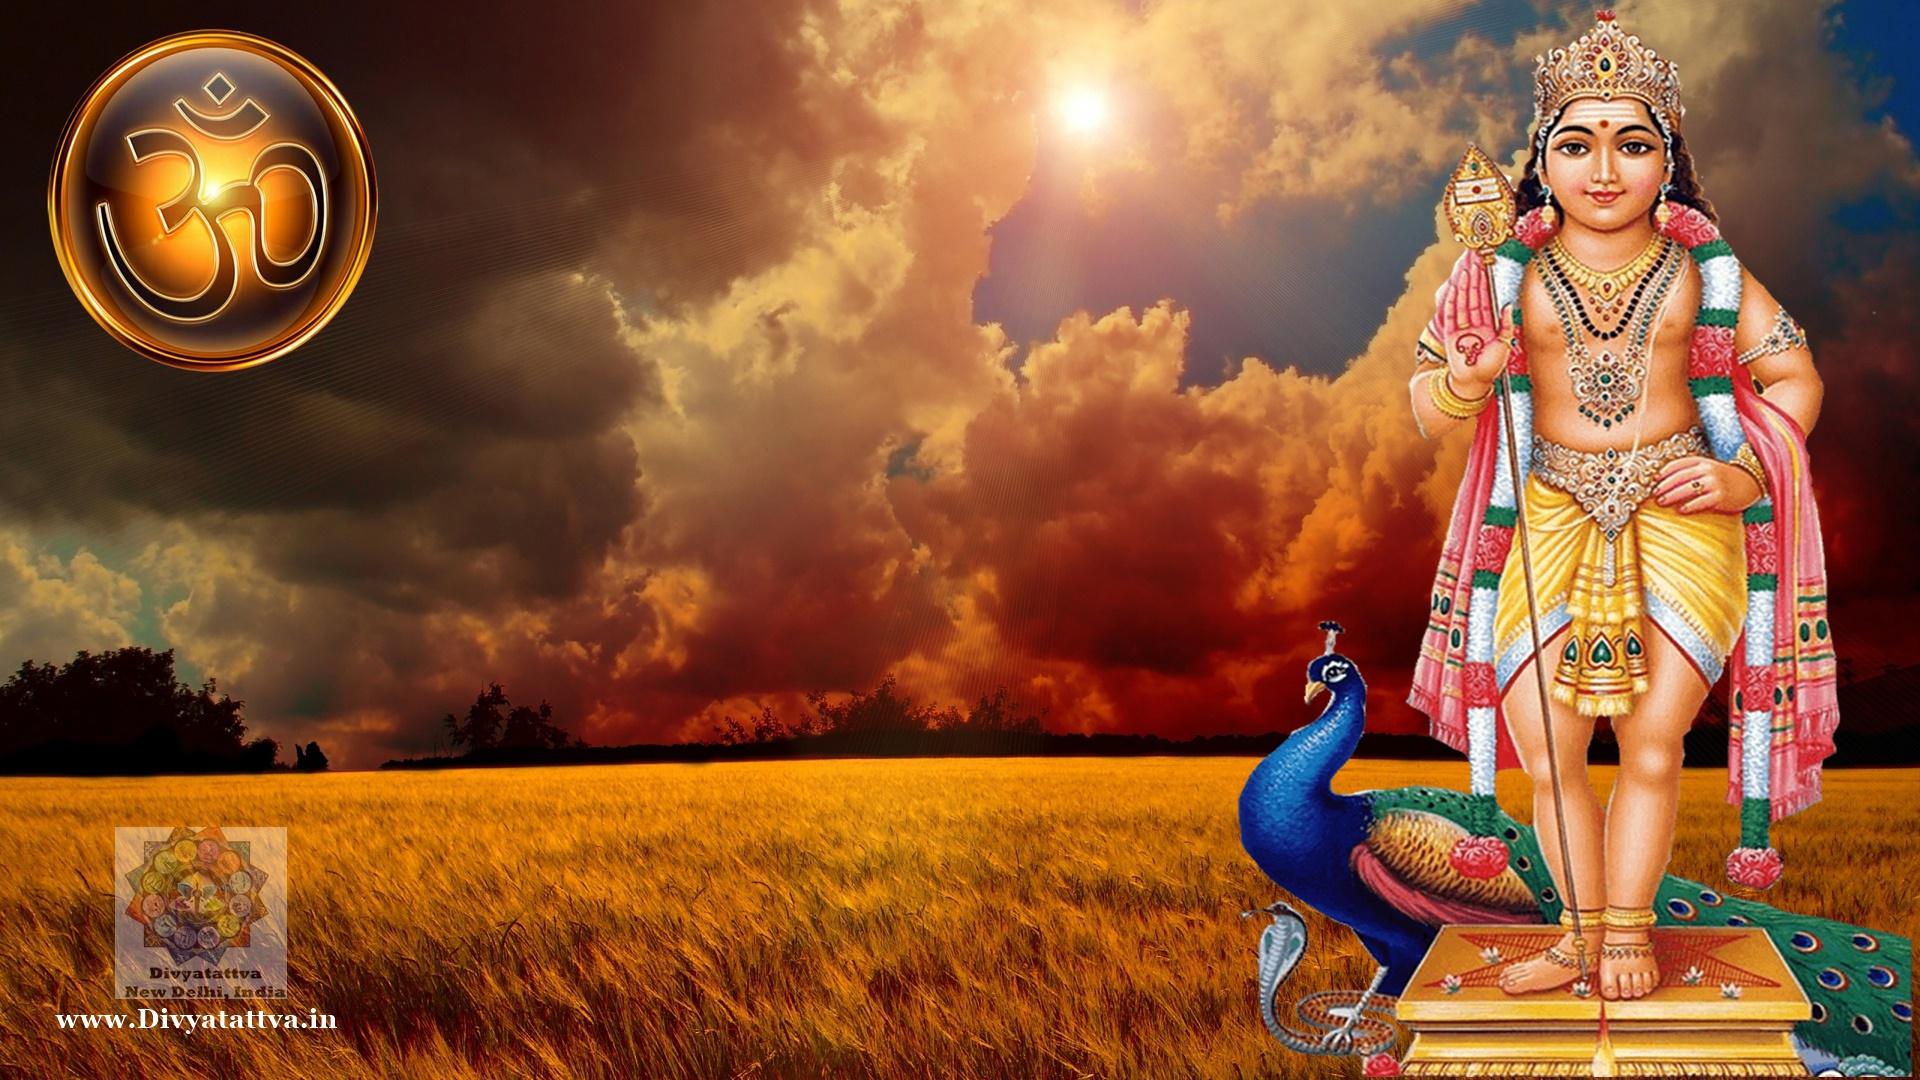 Hindu God Muruga wallpapers, Indian God Kartikeya, Subrahmanya 4k HD Wallpapers & Backgrounds